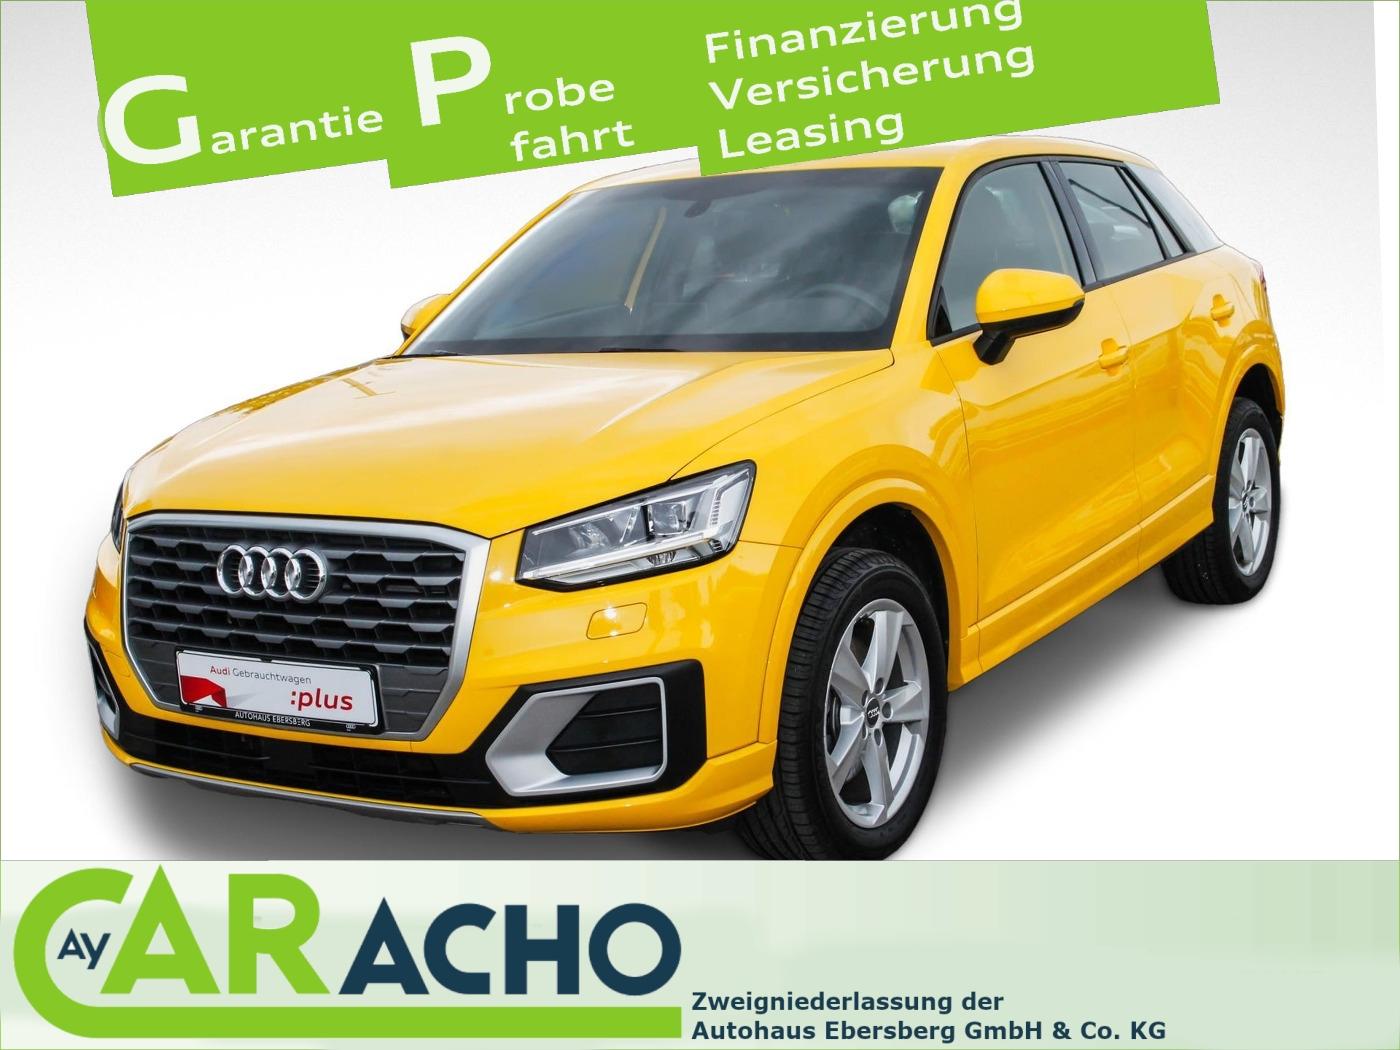 Audi Q2 Sport 1.4 TFSI cod 5JGar LED PDC sound+ BT, Jahr 2018, Benzin